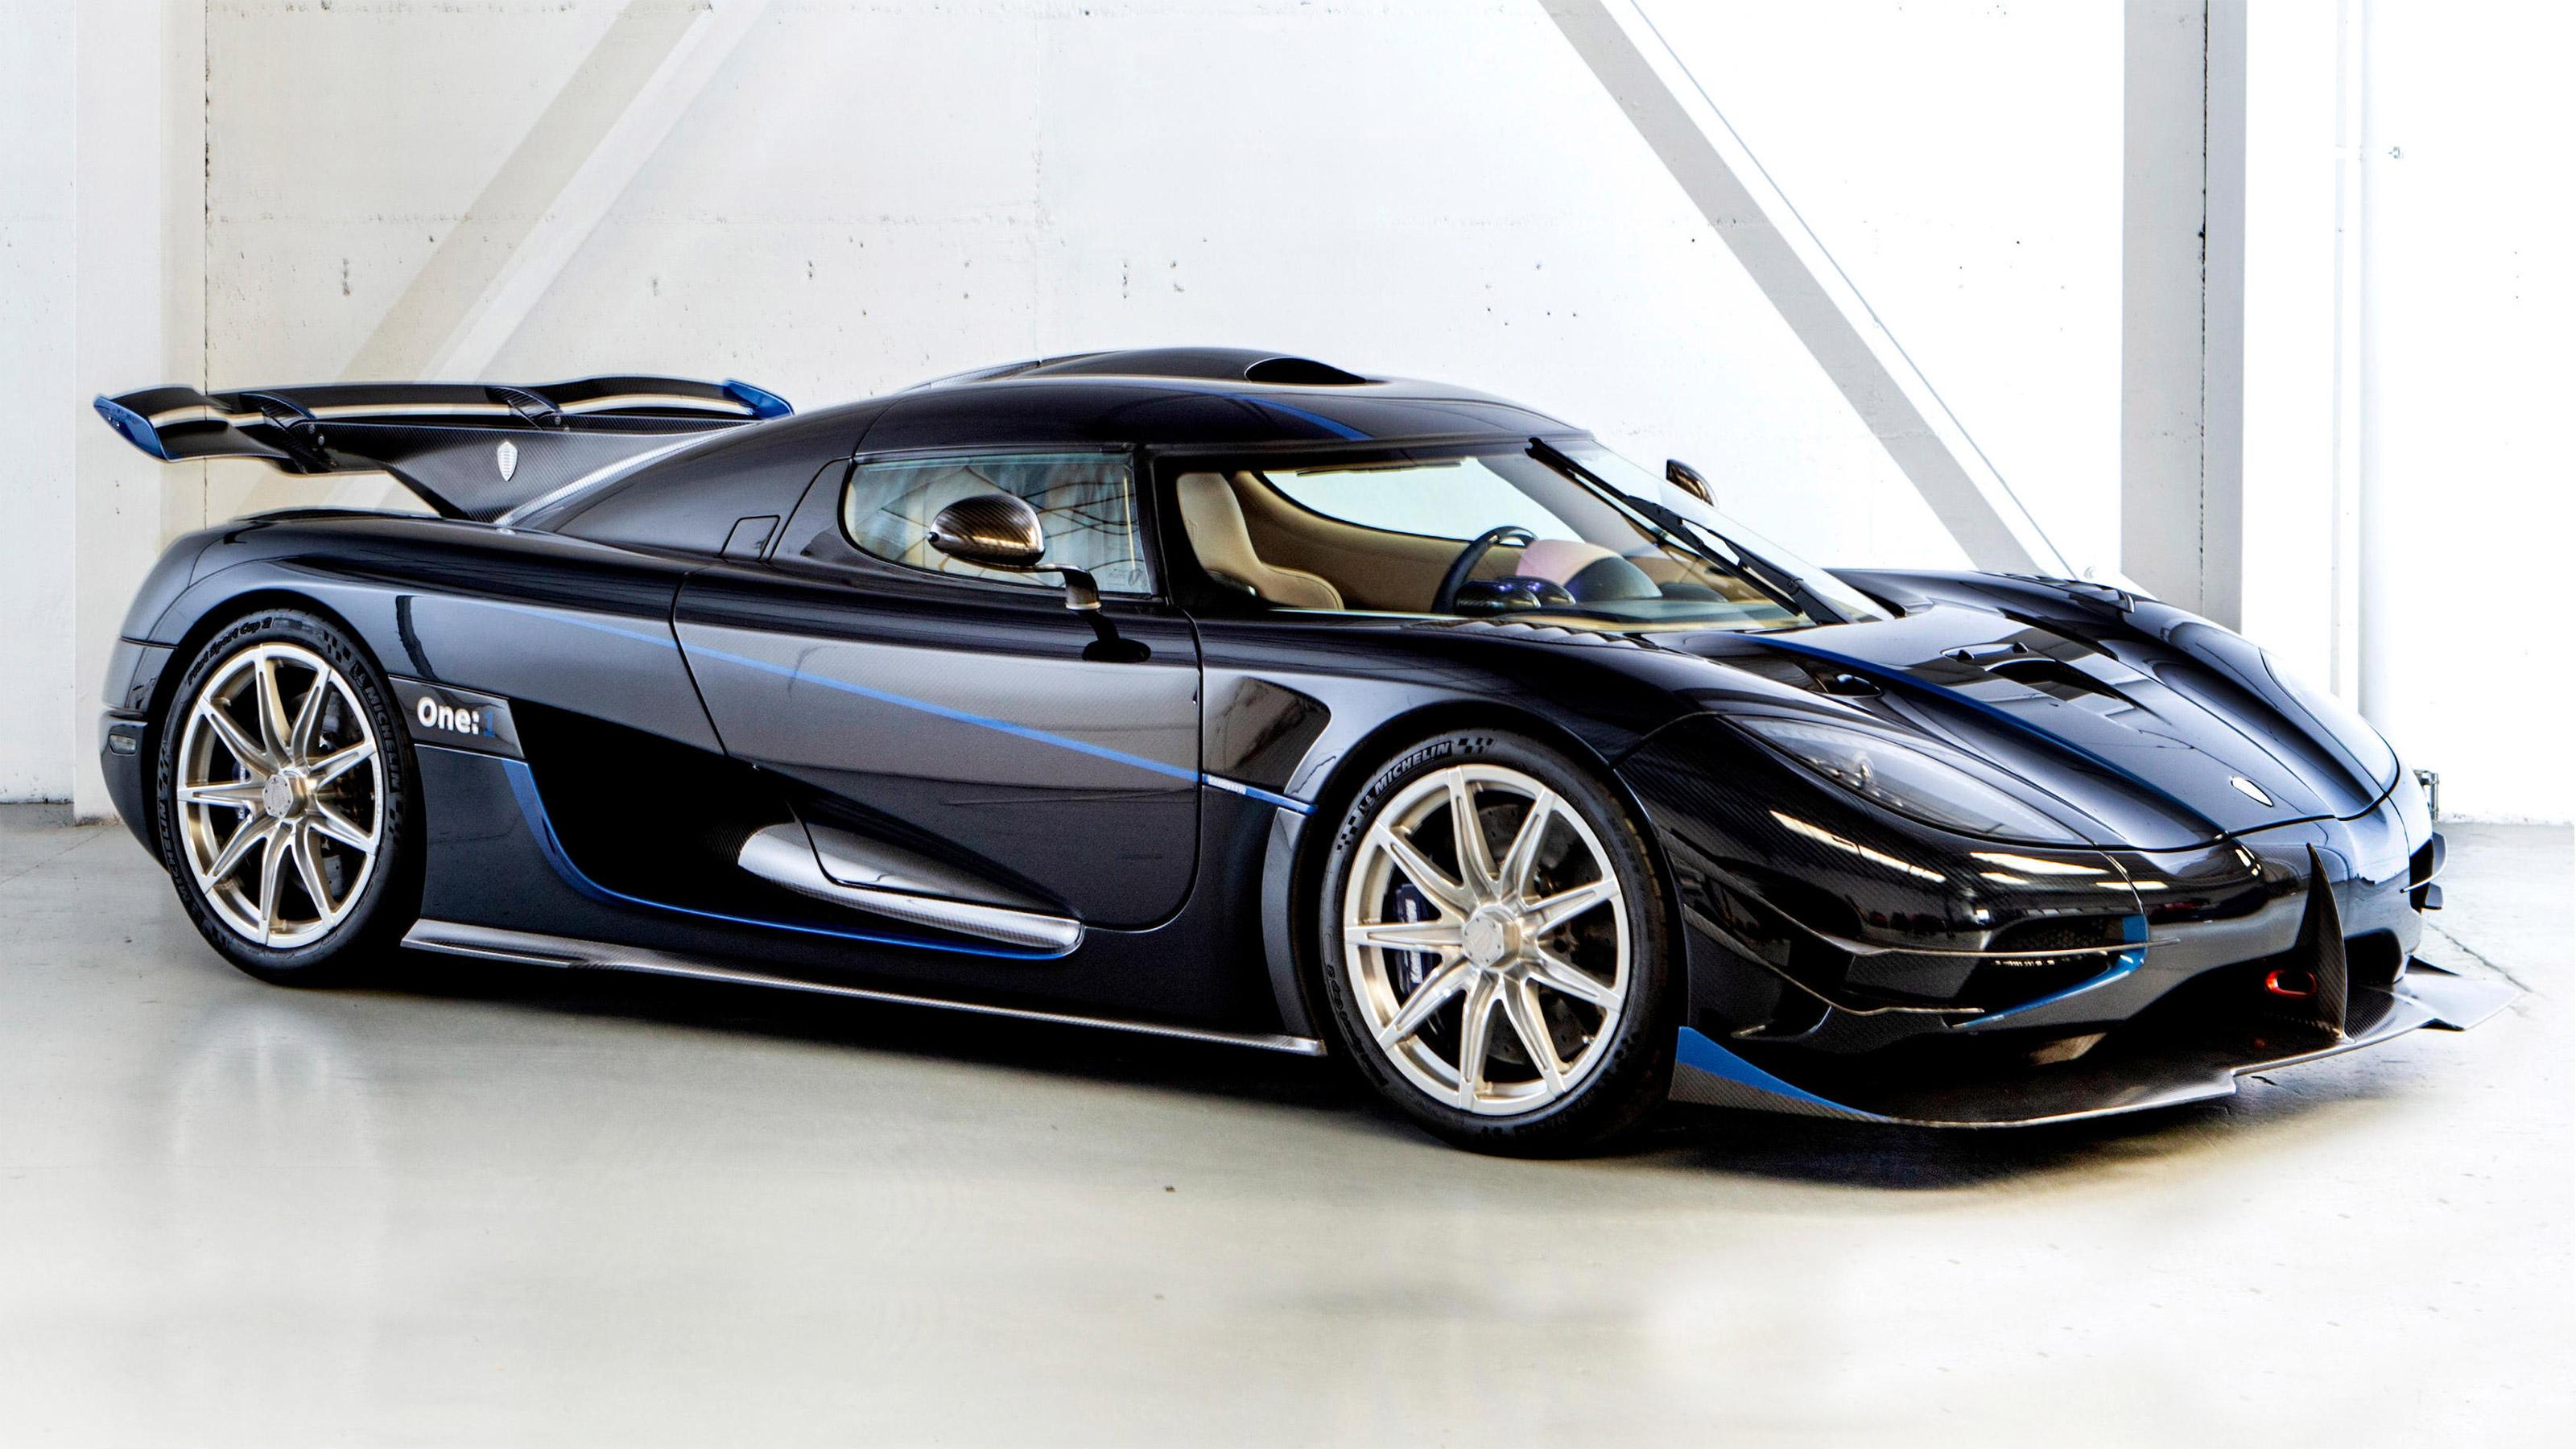 Lamborghini Veneno For Sale >> Bonhams Bonmont Sale Auction Highlights Lamborghini Veneno